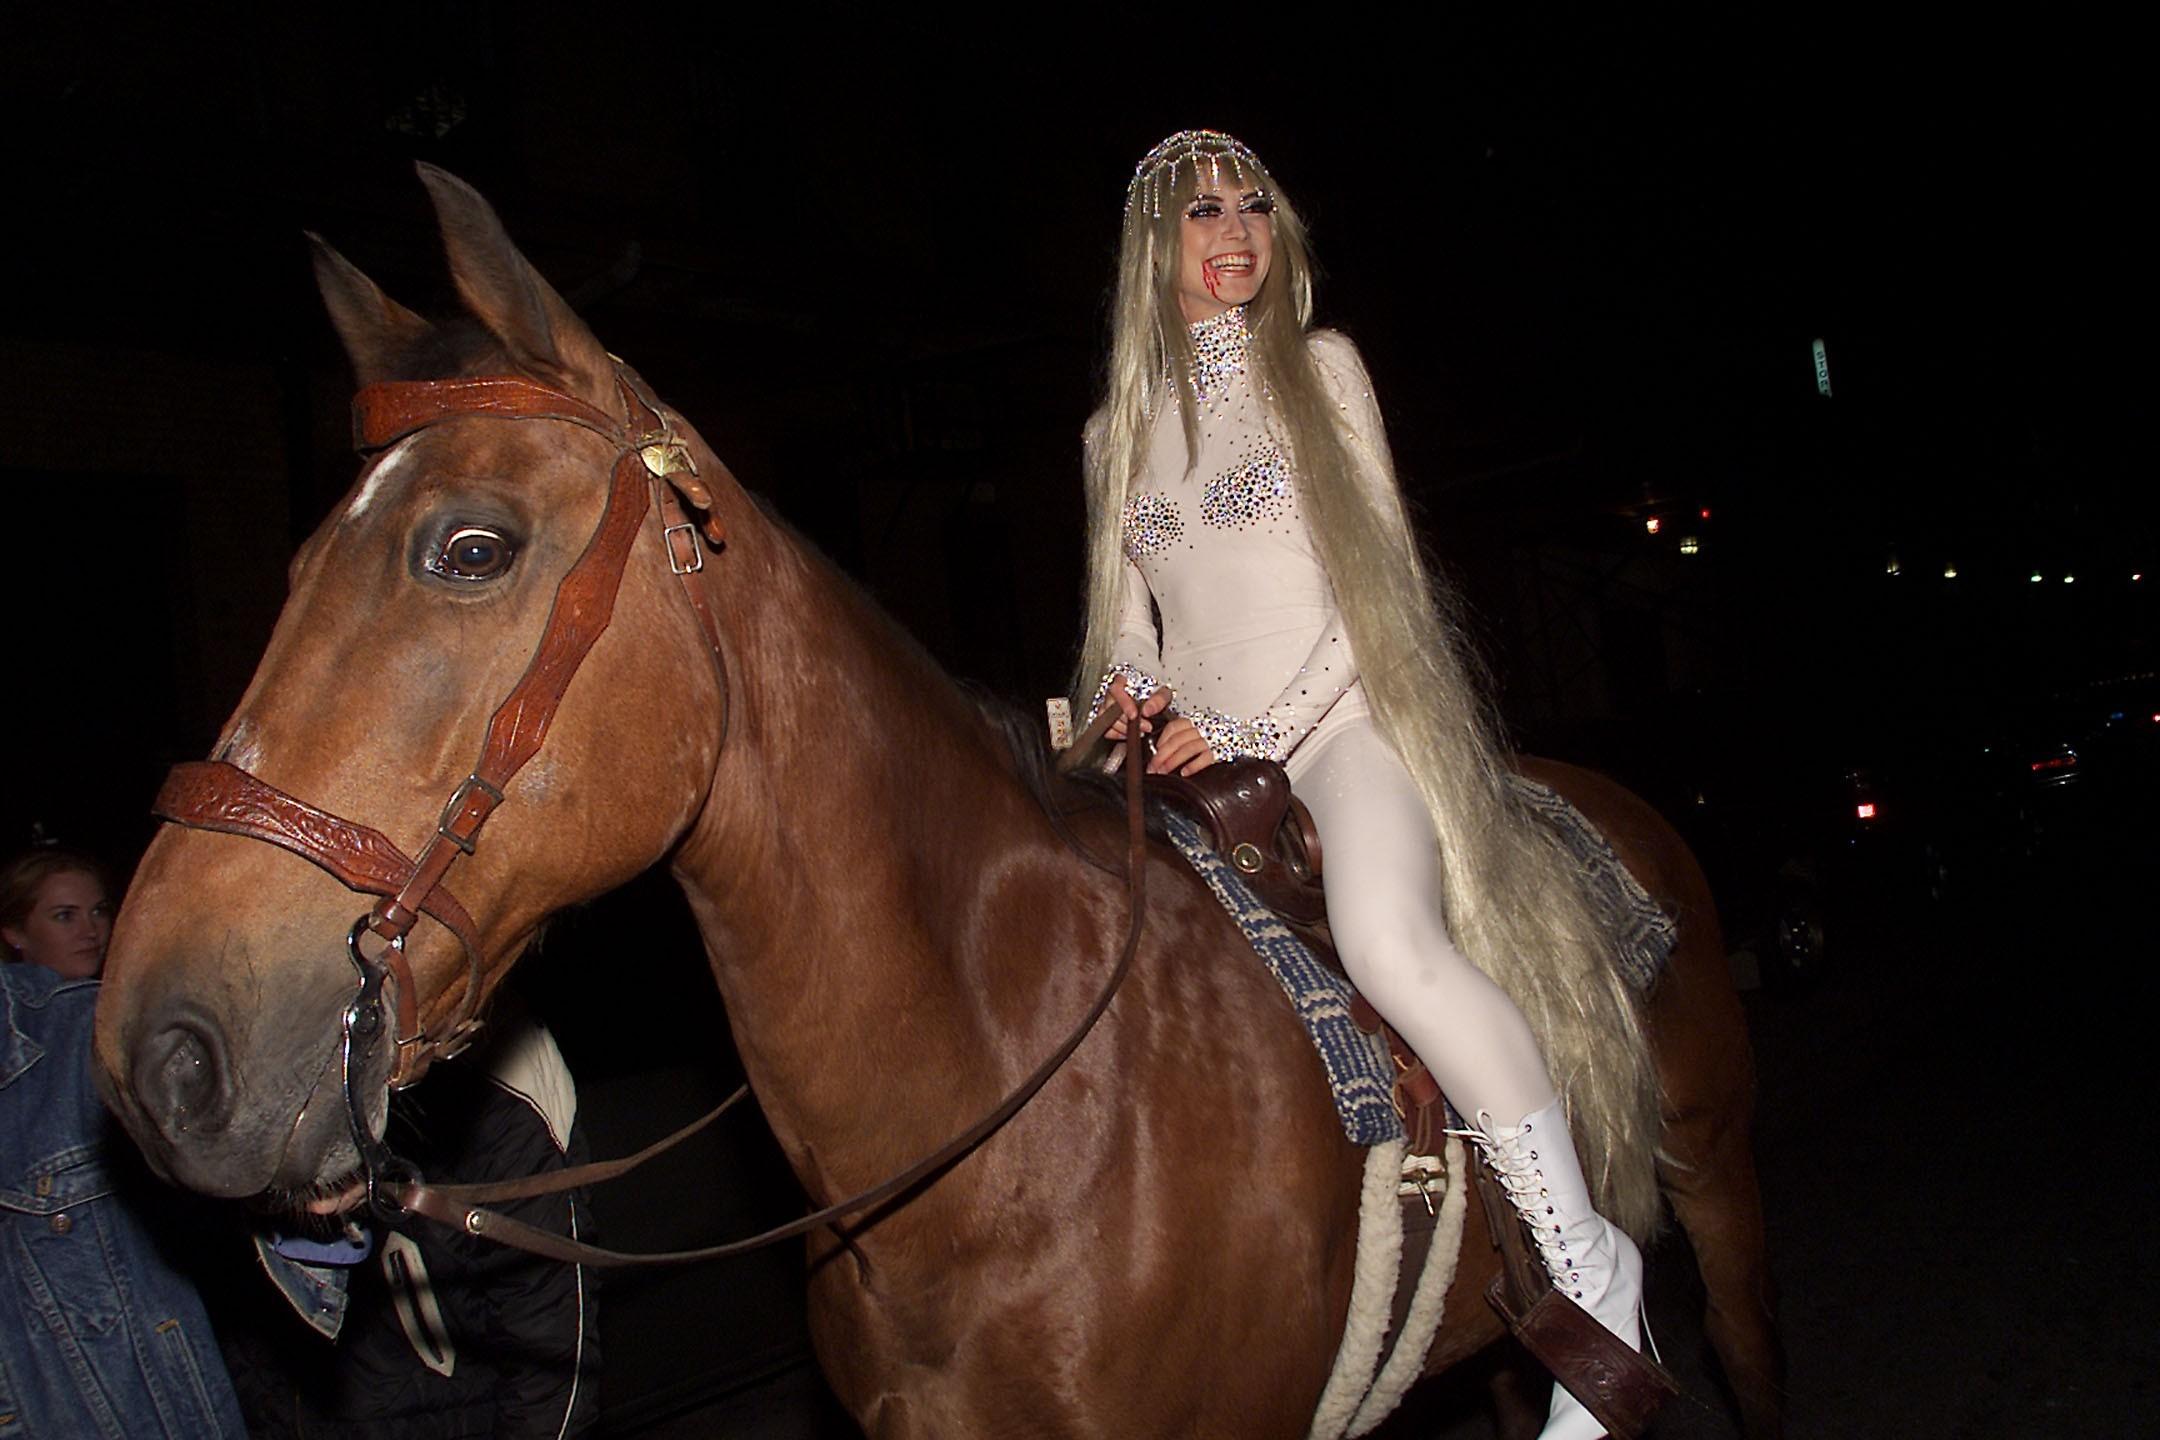 heidi klum 2001 lady godiva halloween